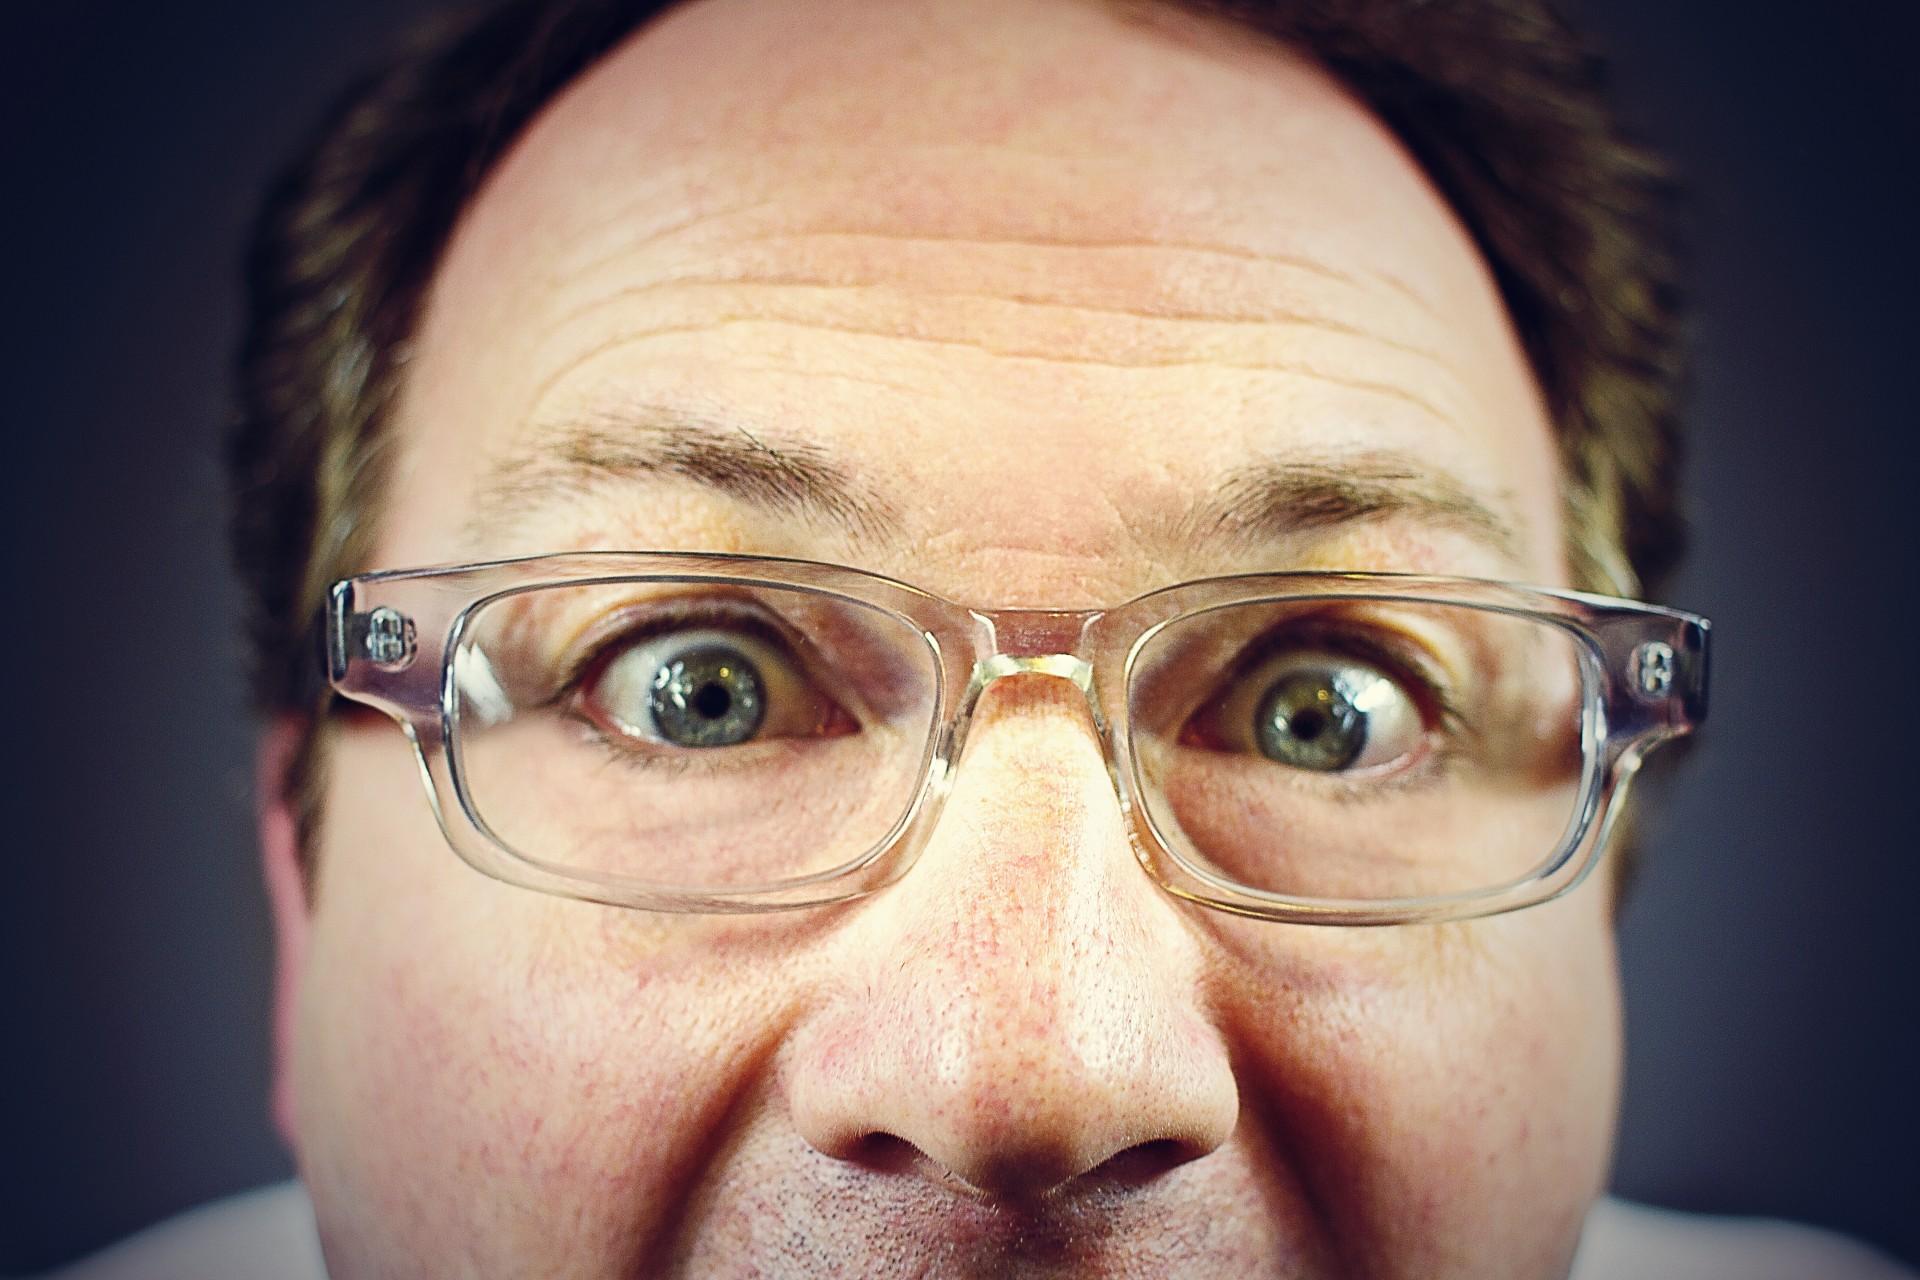 Peeping tom,staring man,creepy man,middle aged man,dork - free image from  needpix.com